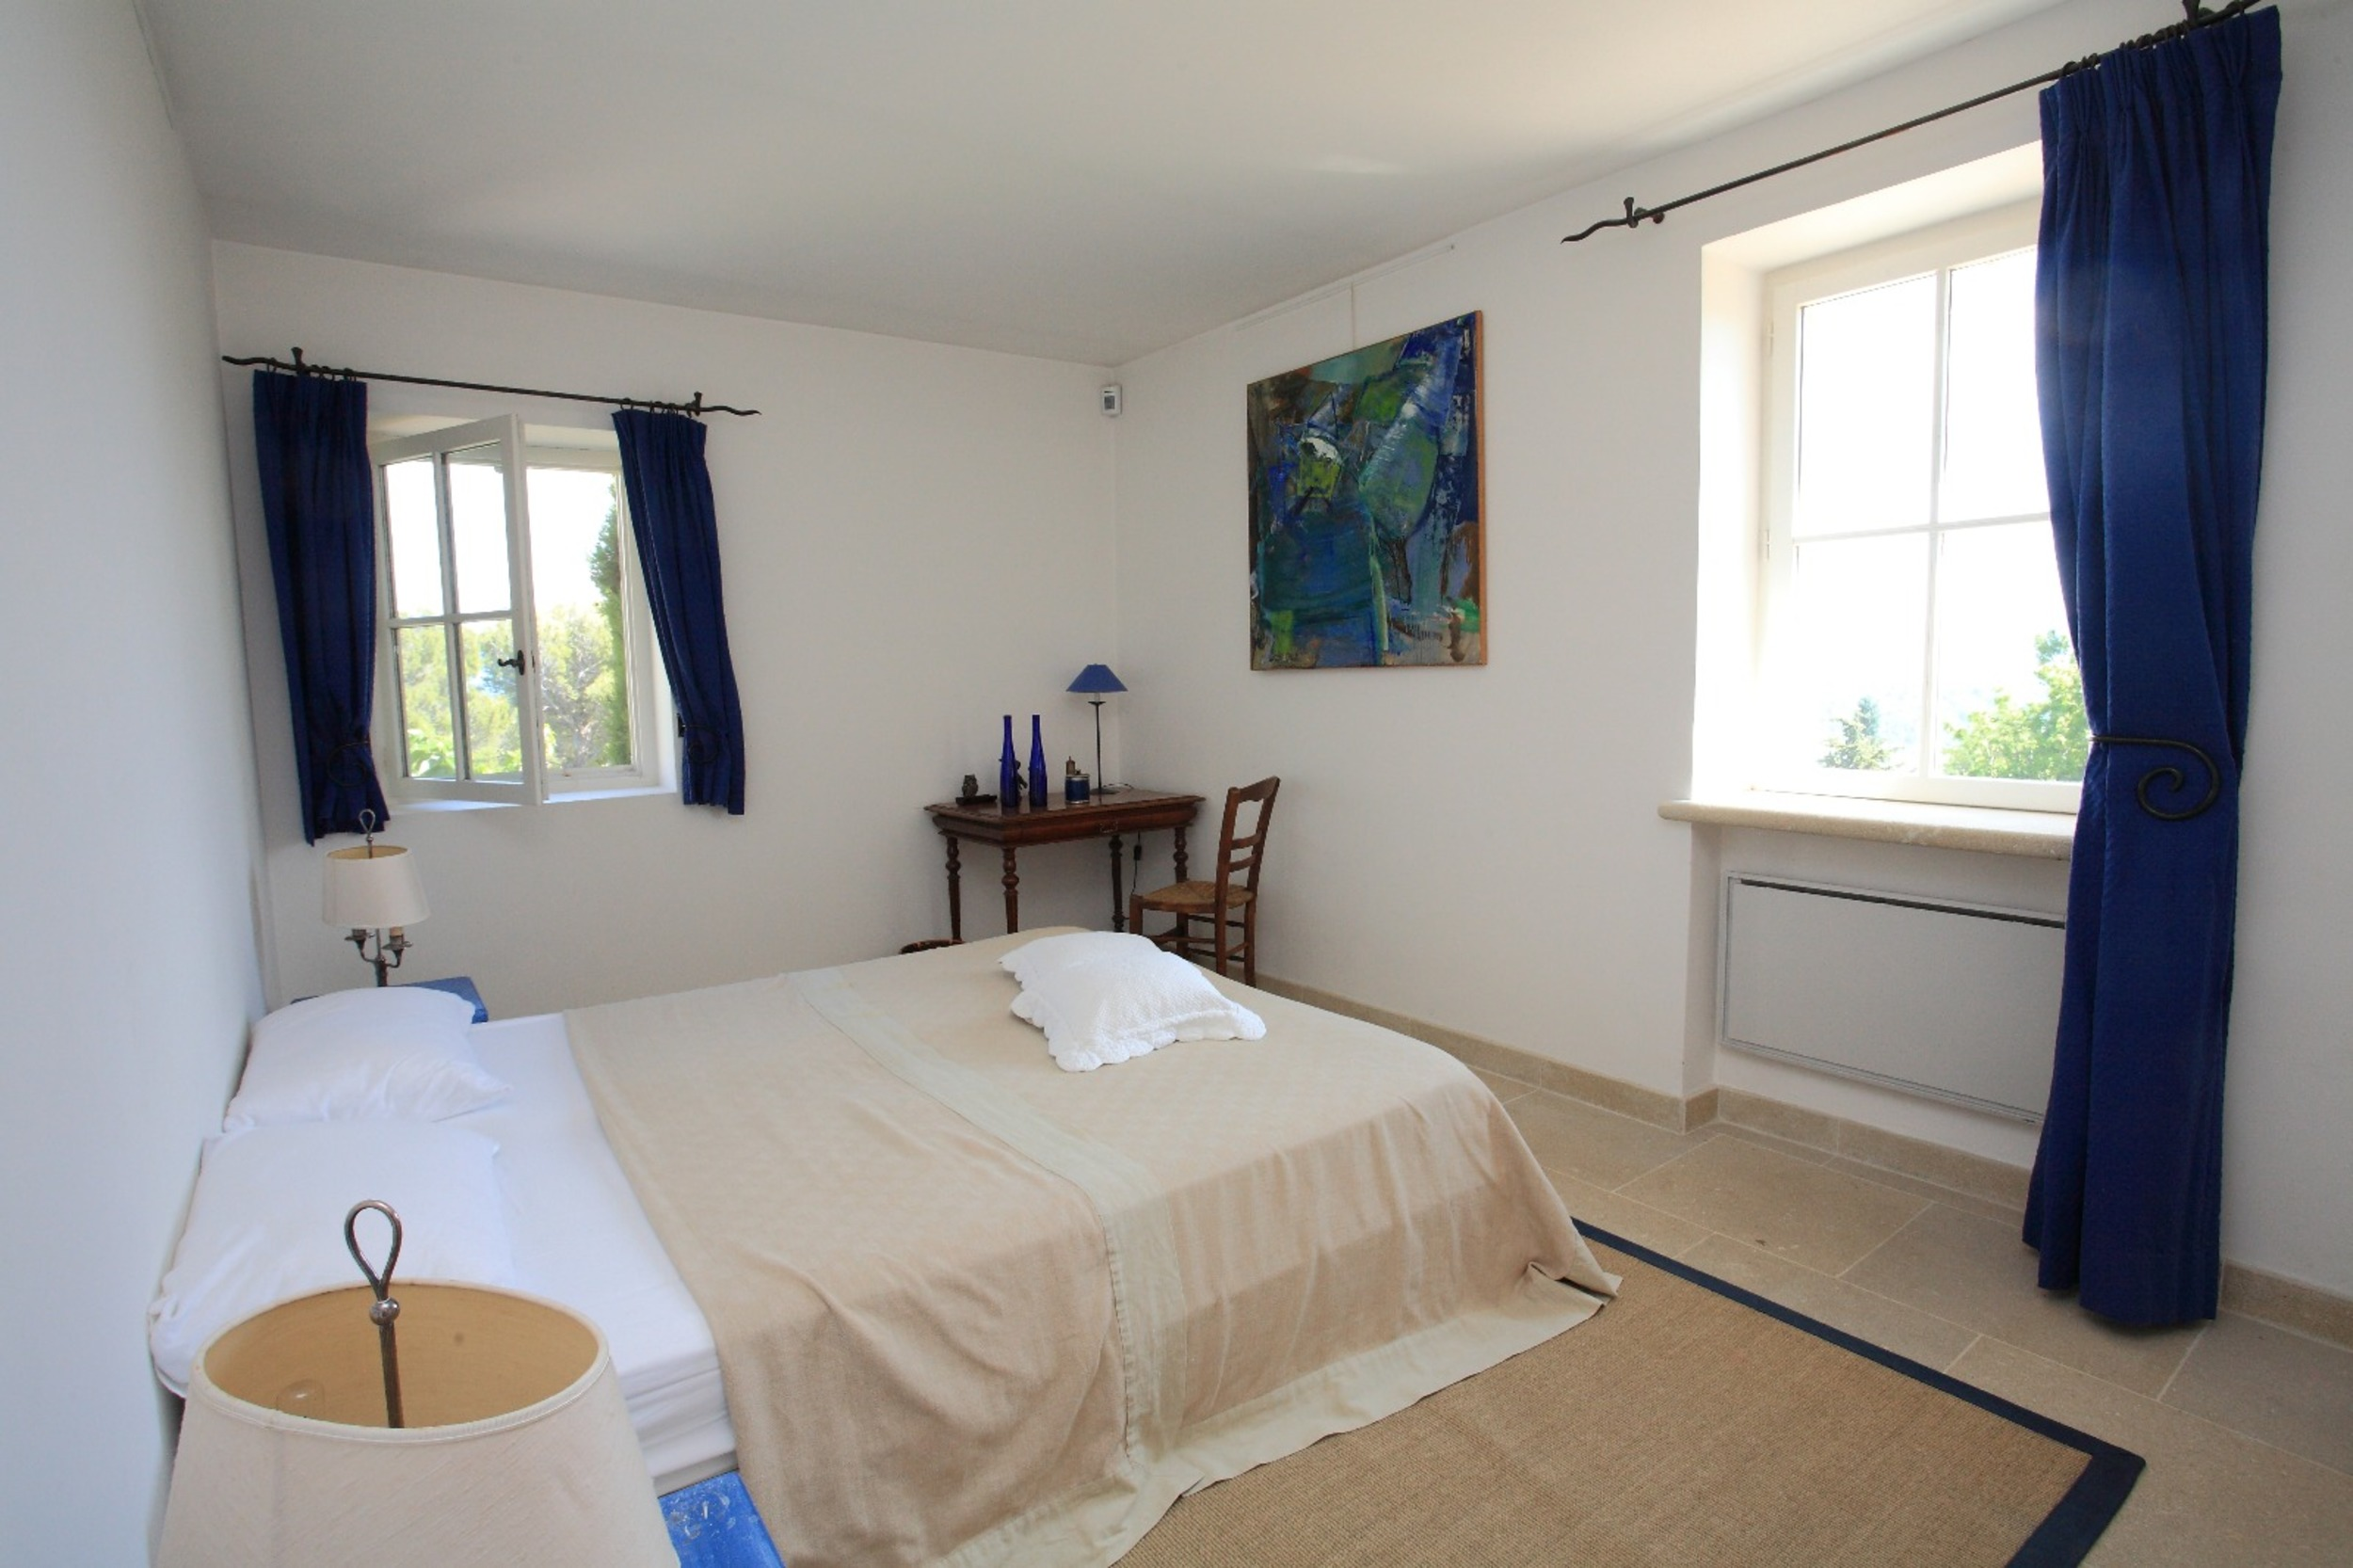 Holiday house Der Fall - Fabelhaftes Landhaus in Gordes (2520443), Gordes, Vaucluse, Provence - Alps - Côte d'Azur, France, picture 21